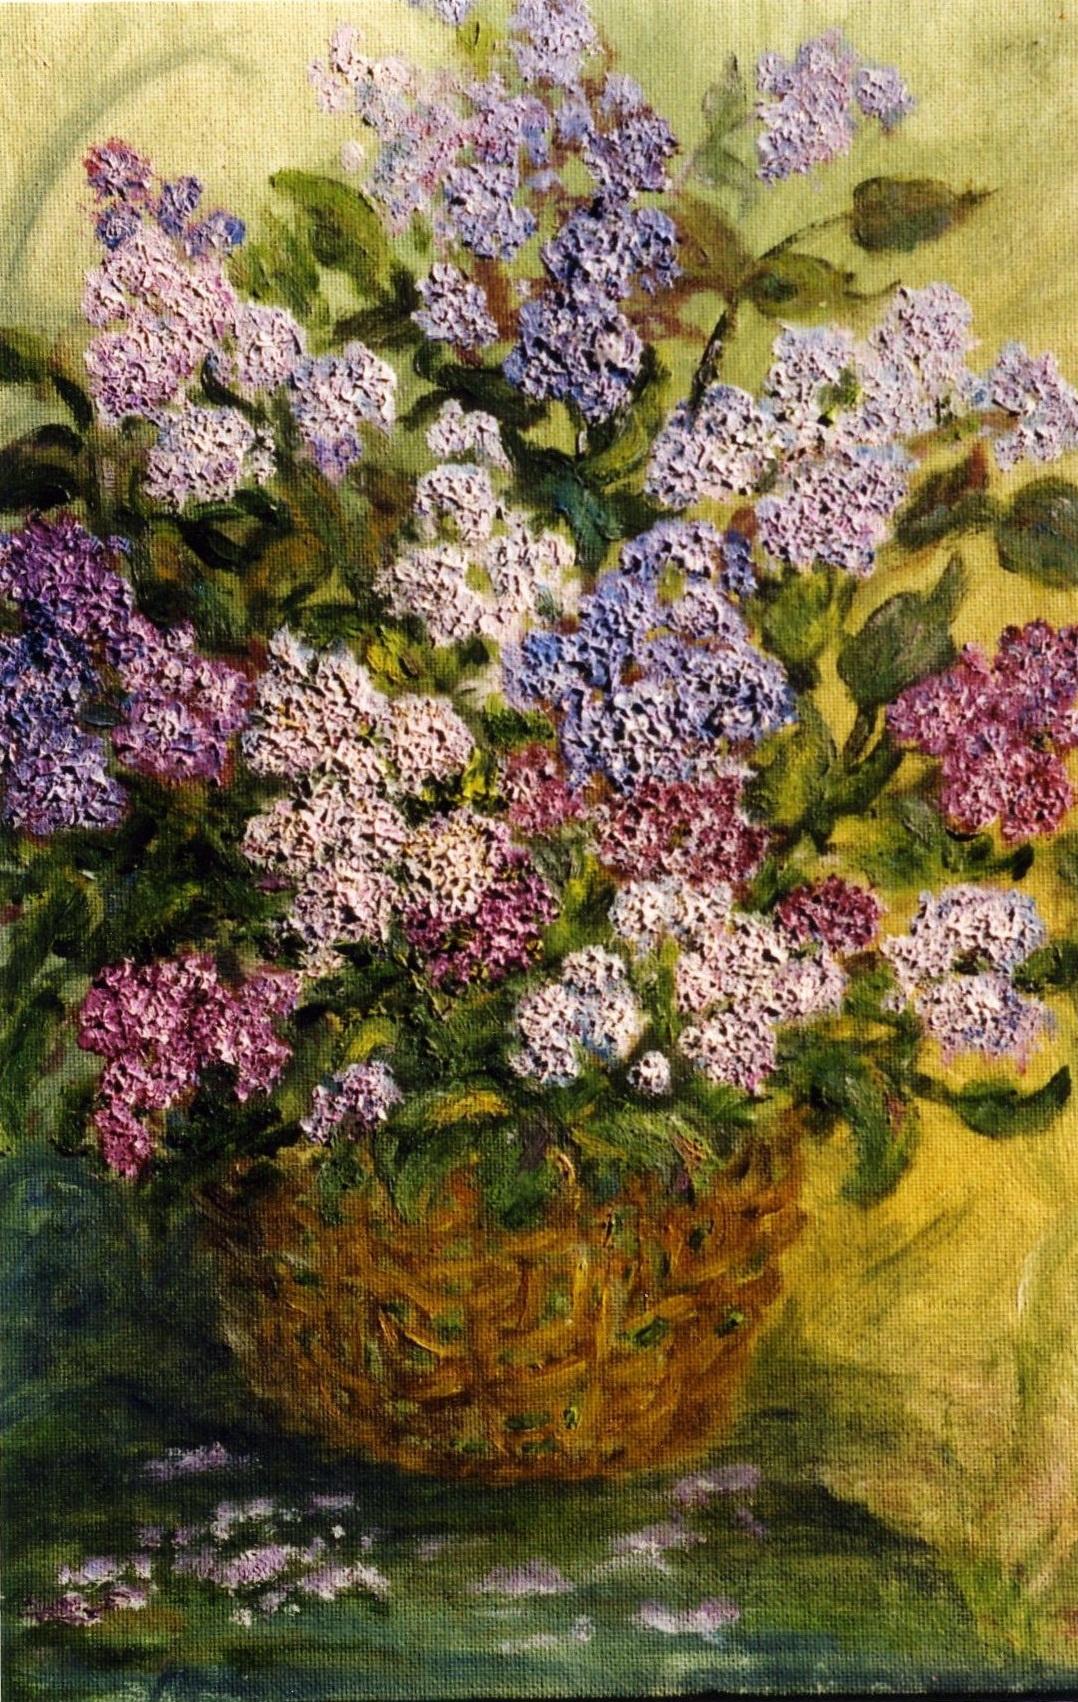 Rita Arkadievna Beckman. Lilac